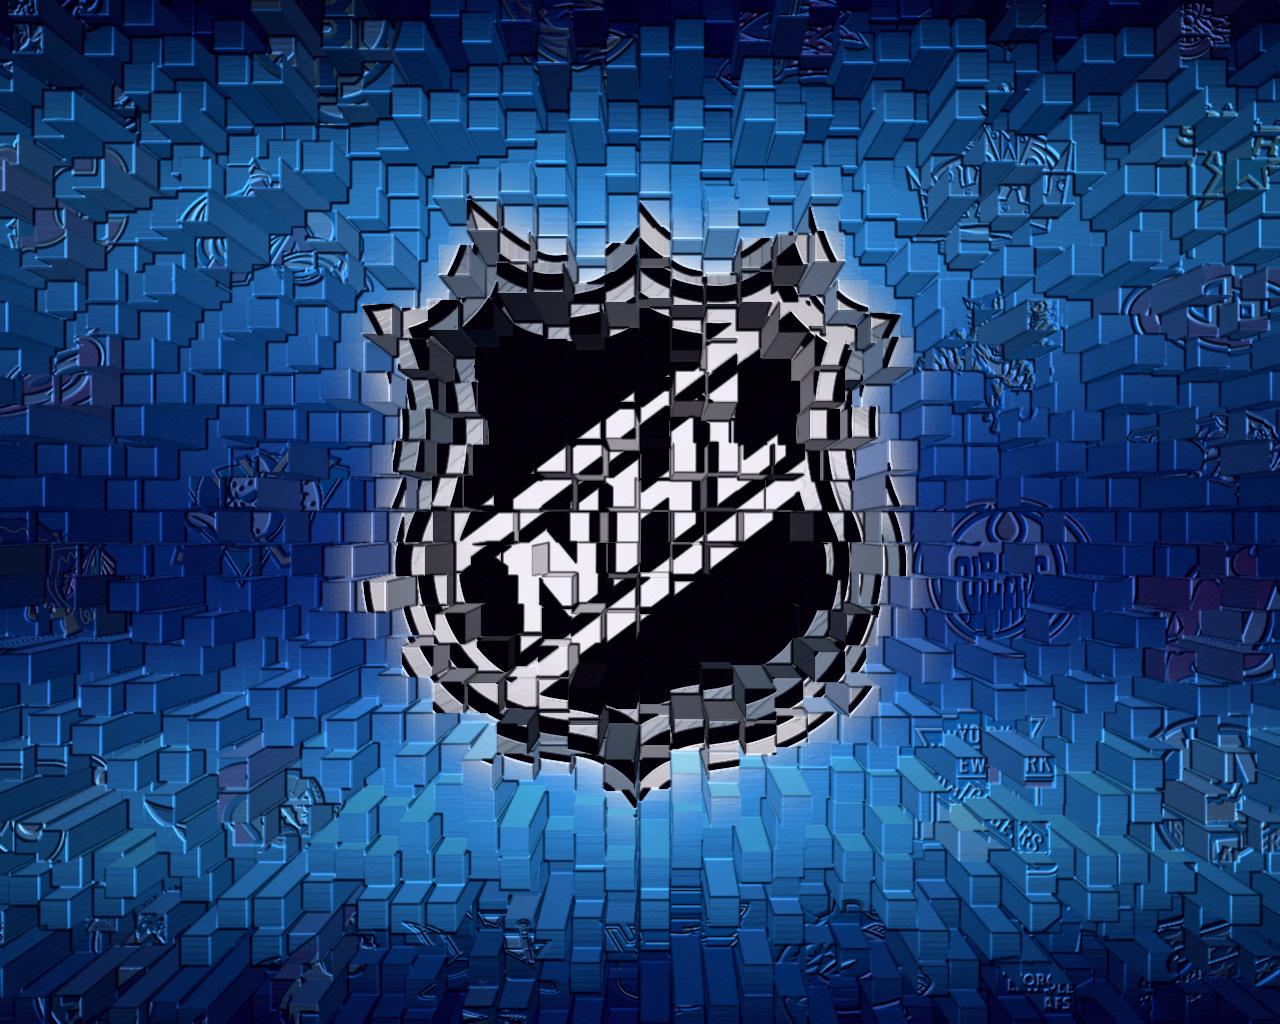 обои на рабочий стол, wallpaper, NHL